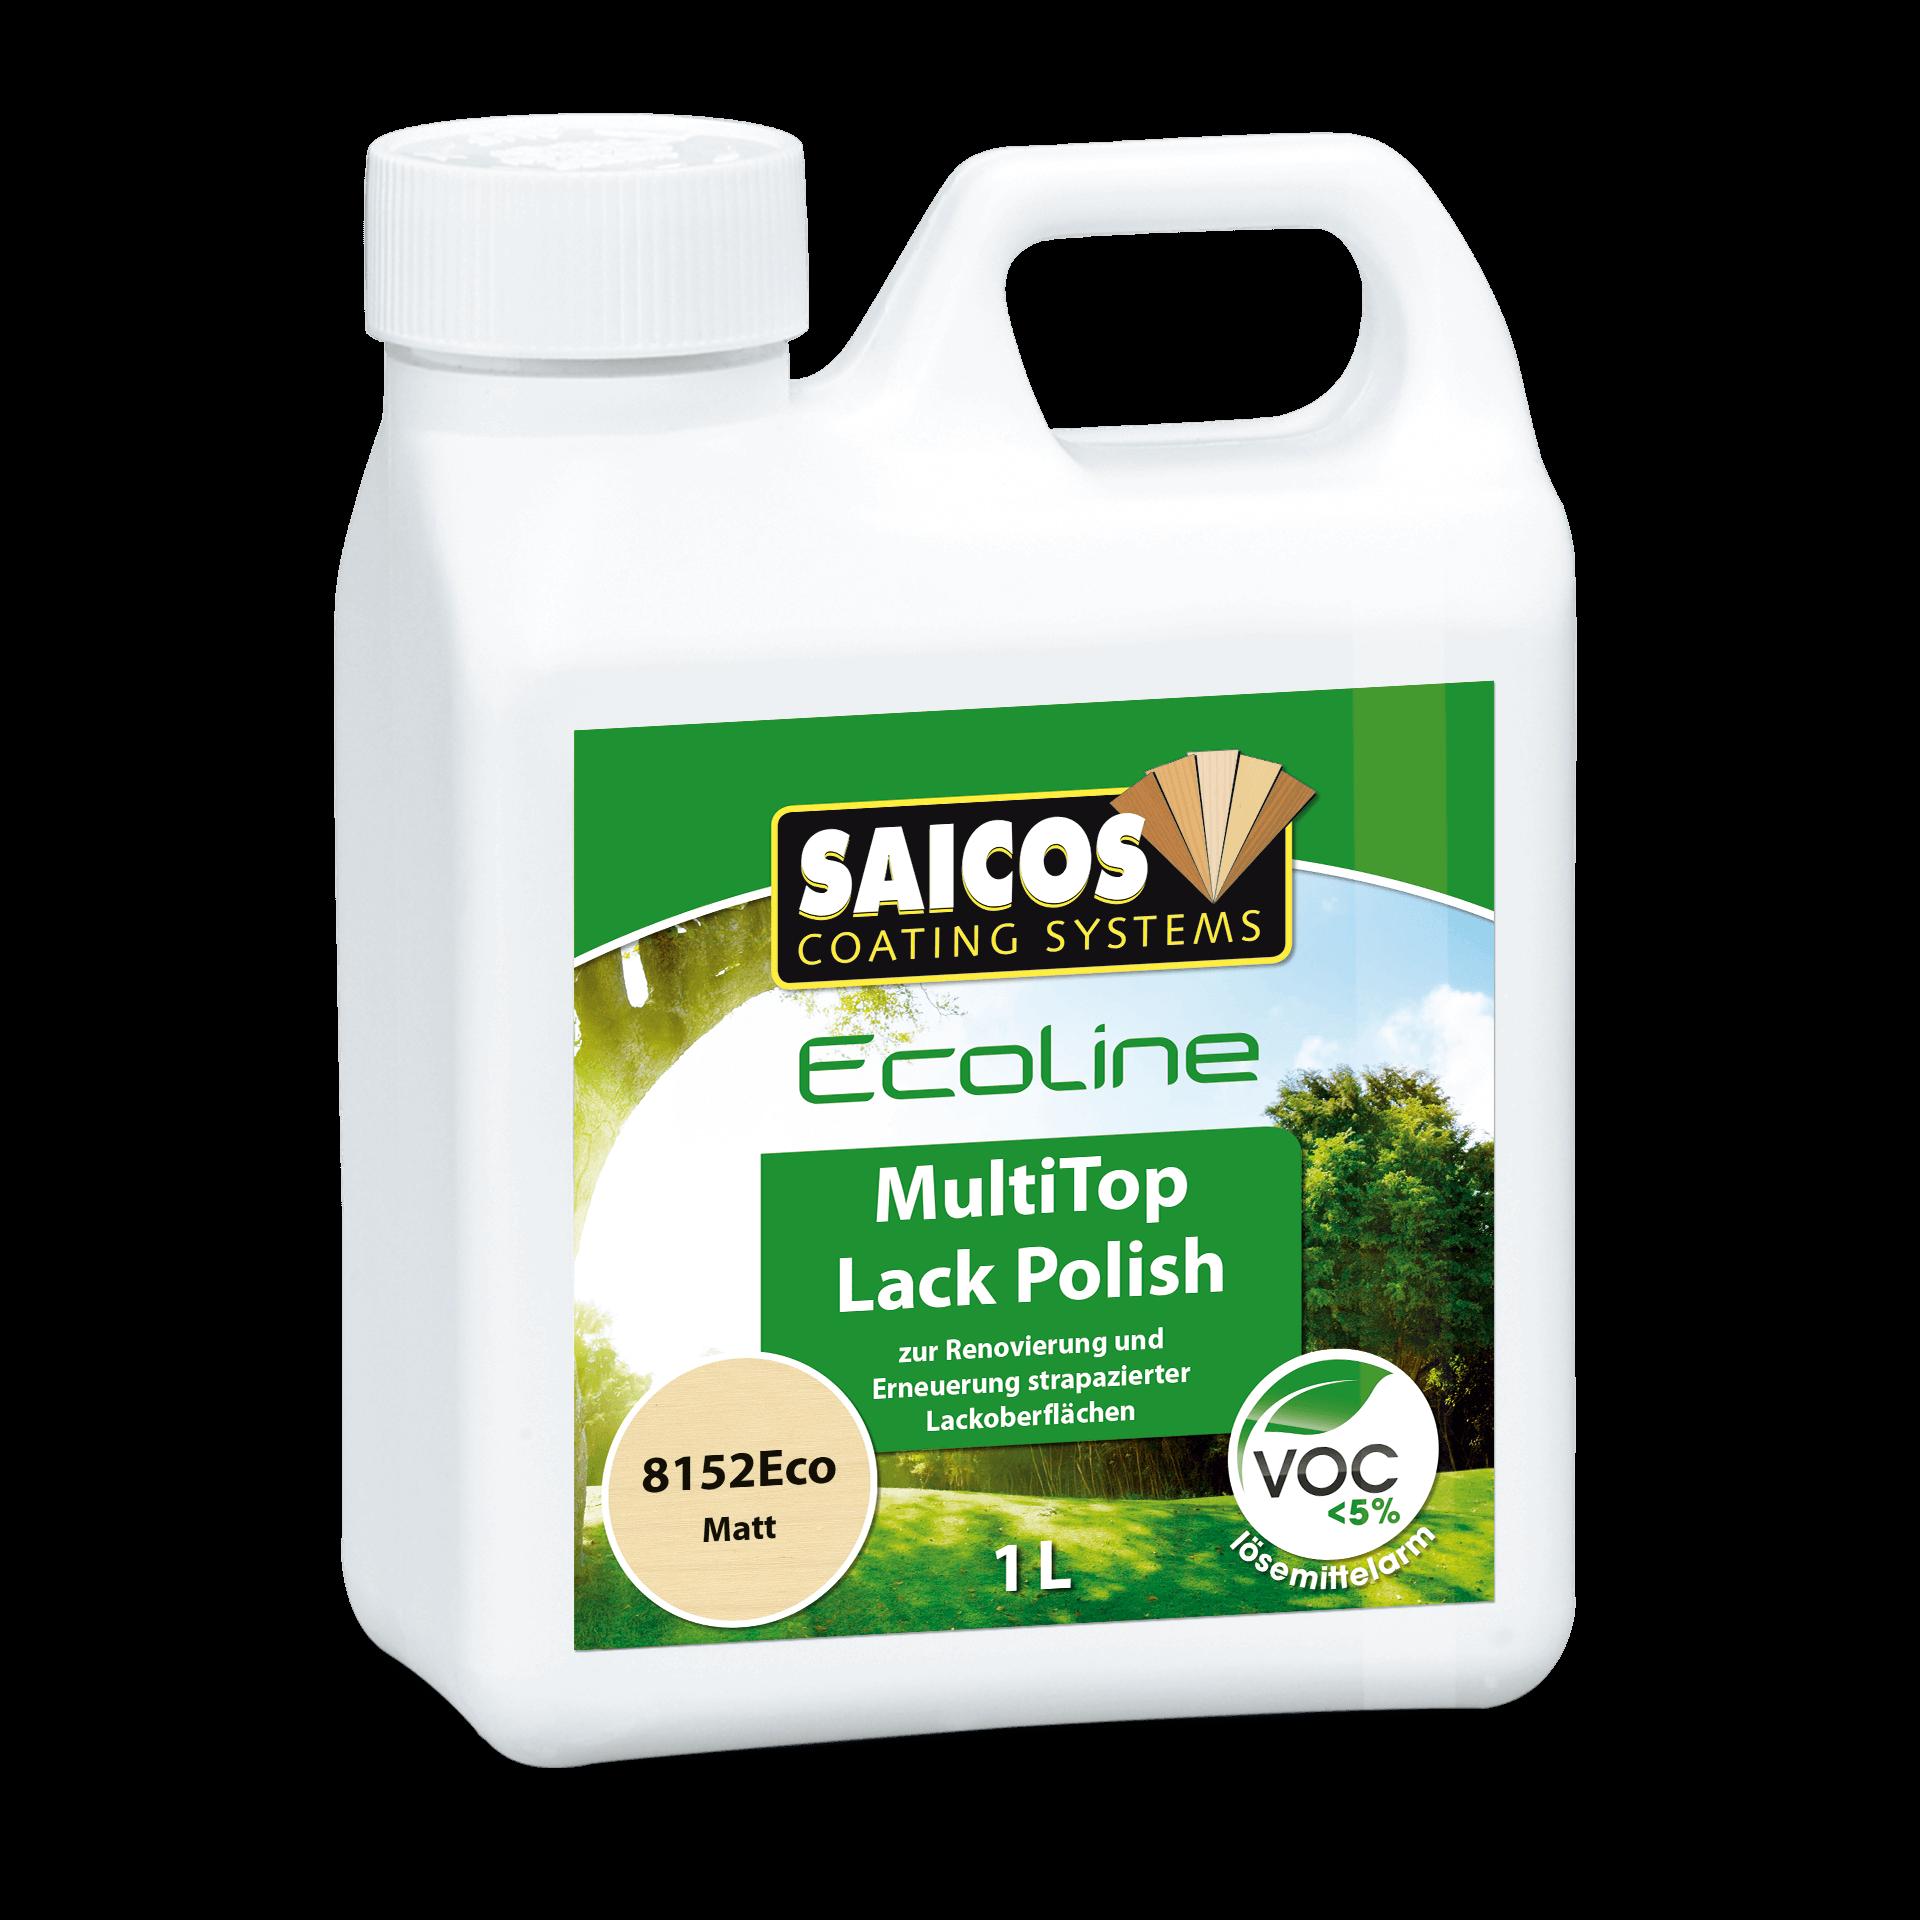 Saicos Ecoline MultiTop Lack Polish